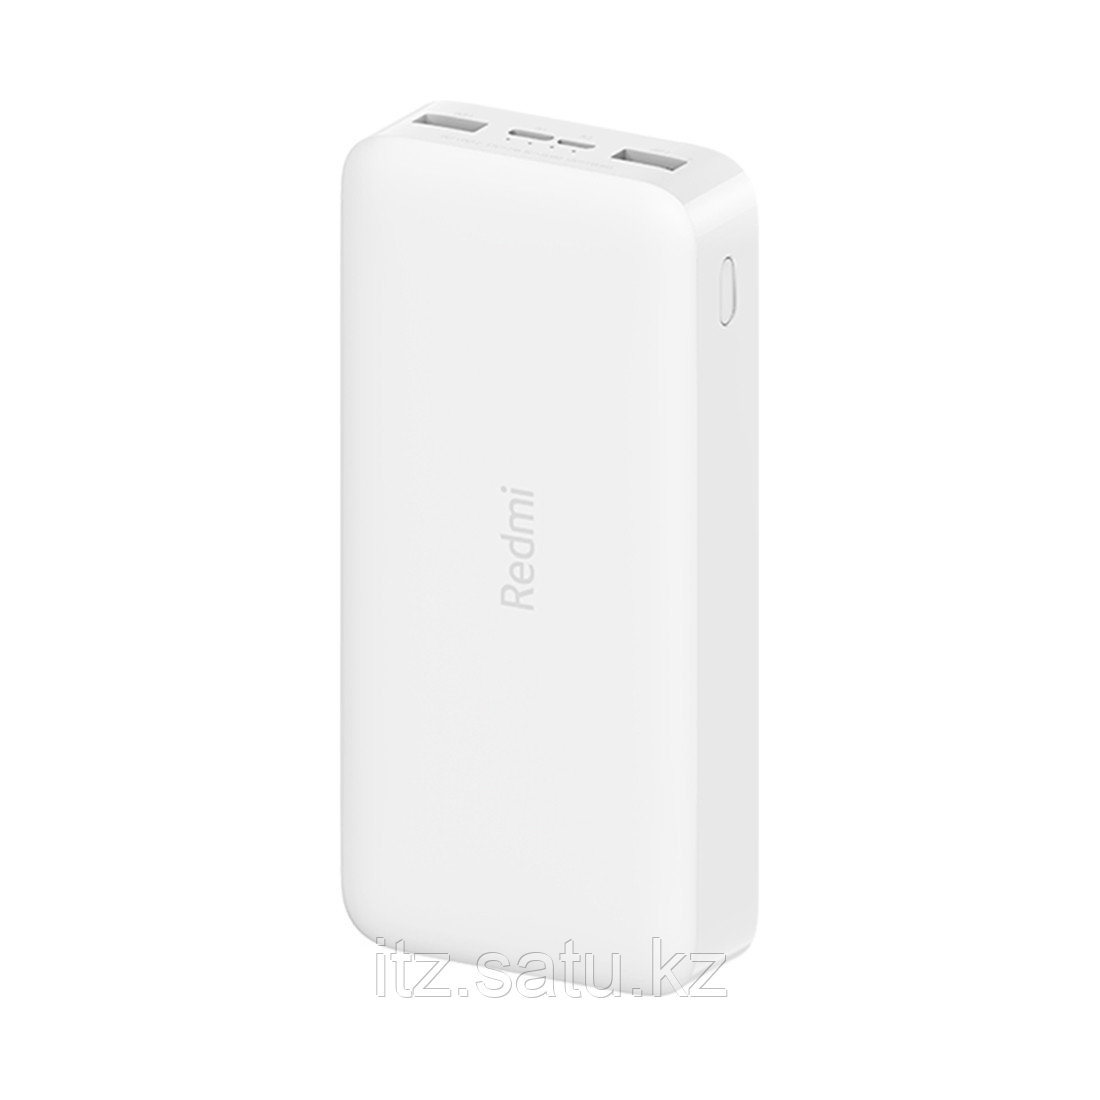 Портативное зарядное устройство Xiaomi Redmi Power Bank 20000mAh (Fast Charge) Белый